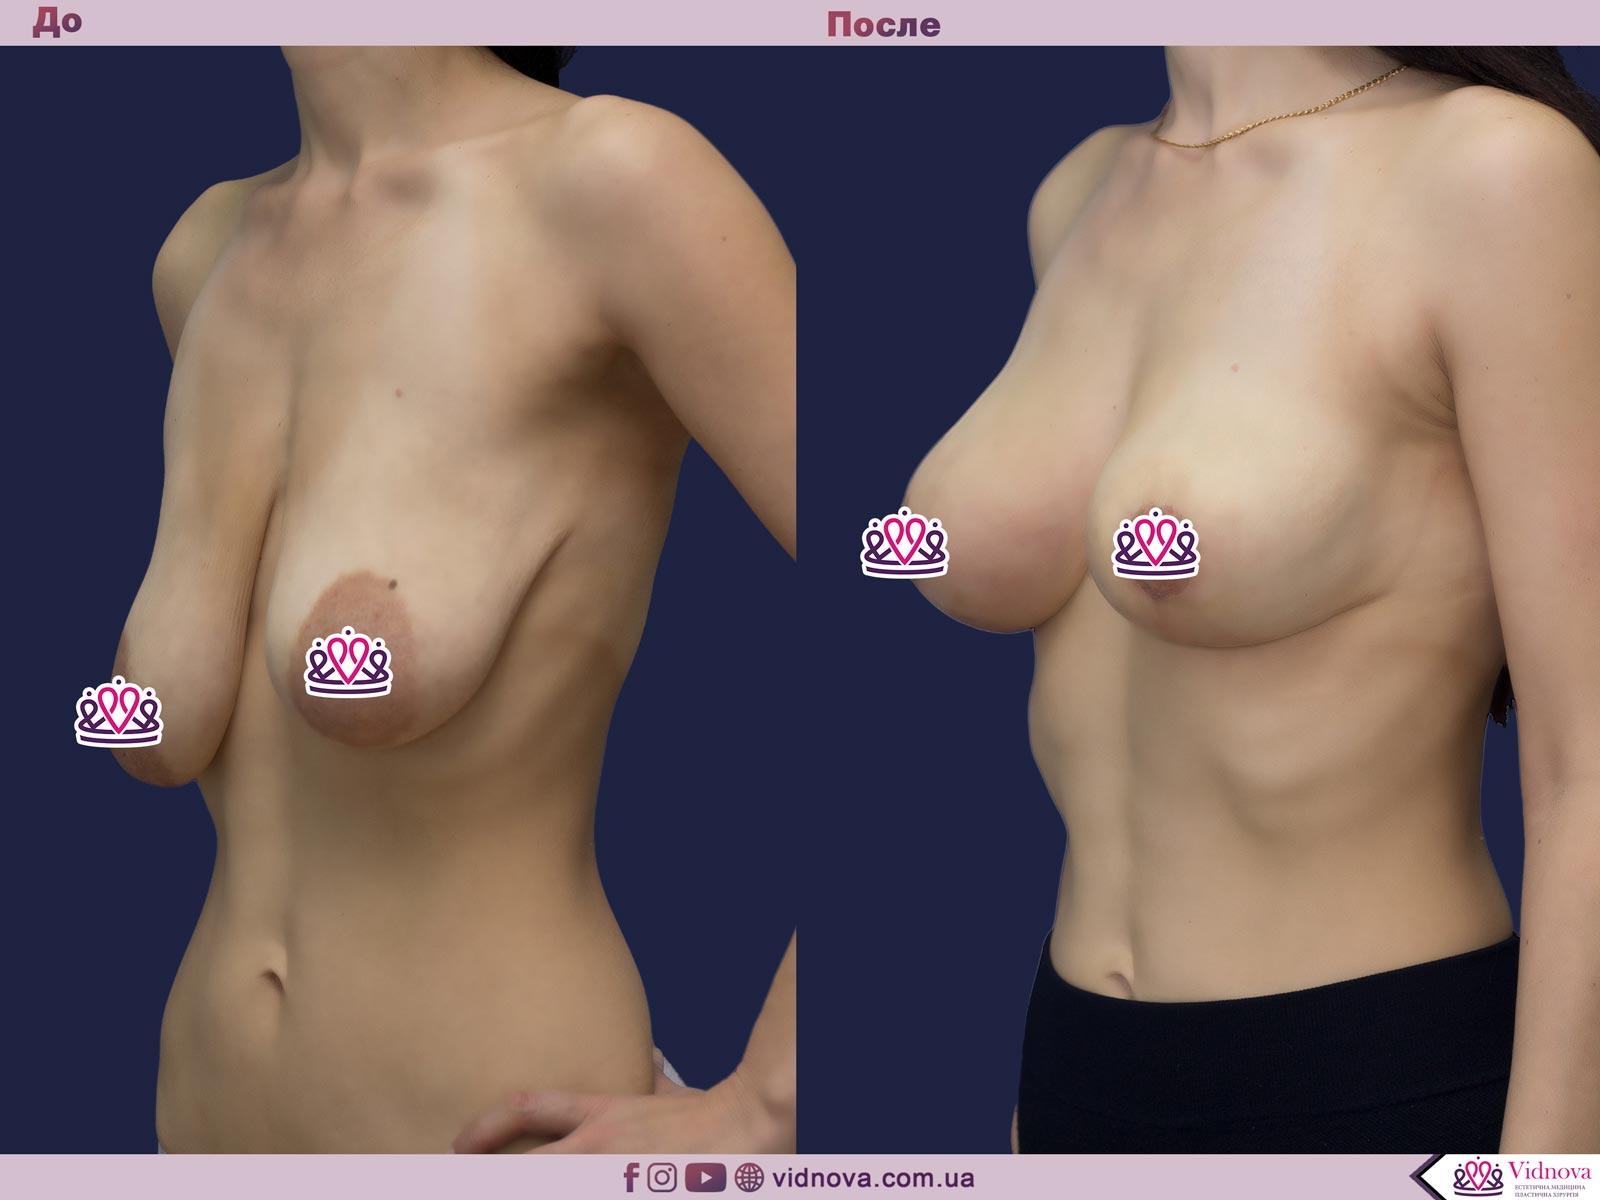 Подтяжка груди: Фото ДО и ПОСЛЕ - Пример №26-3 - Клиника Vidnova